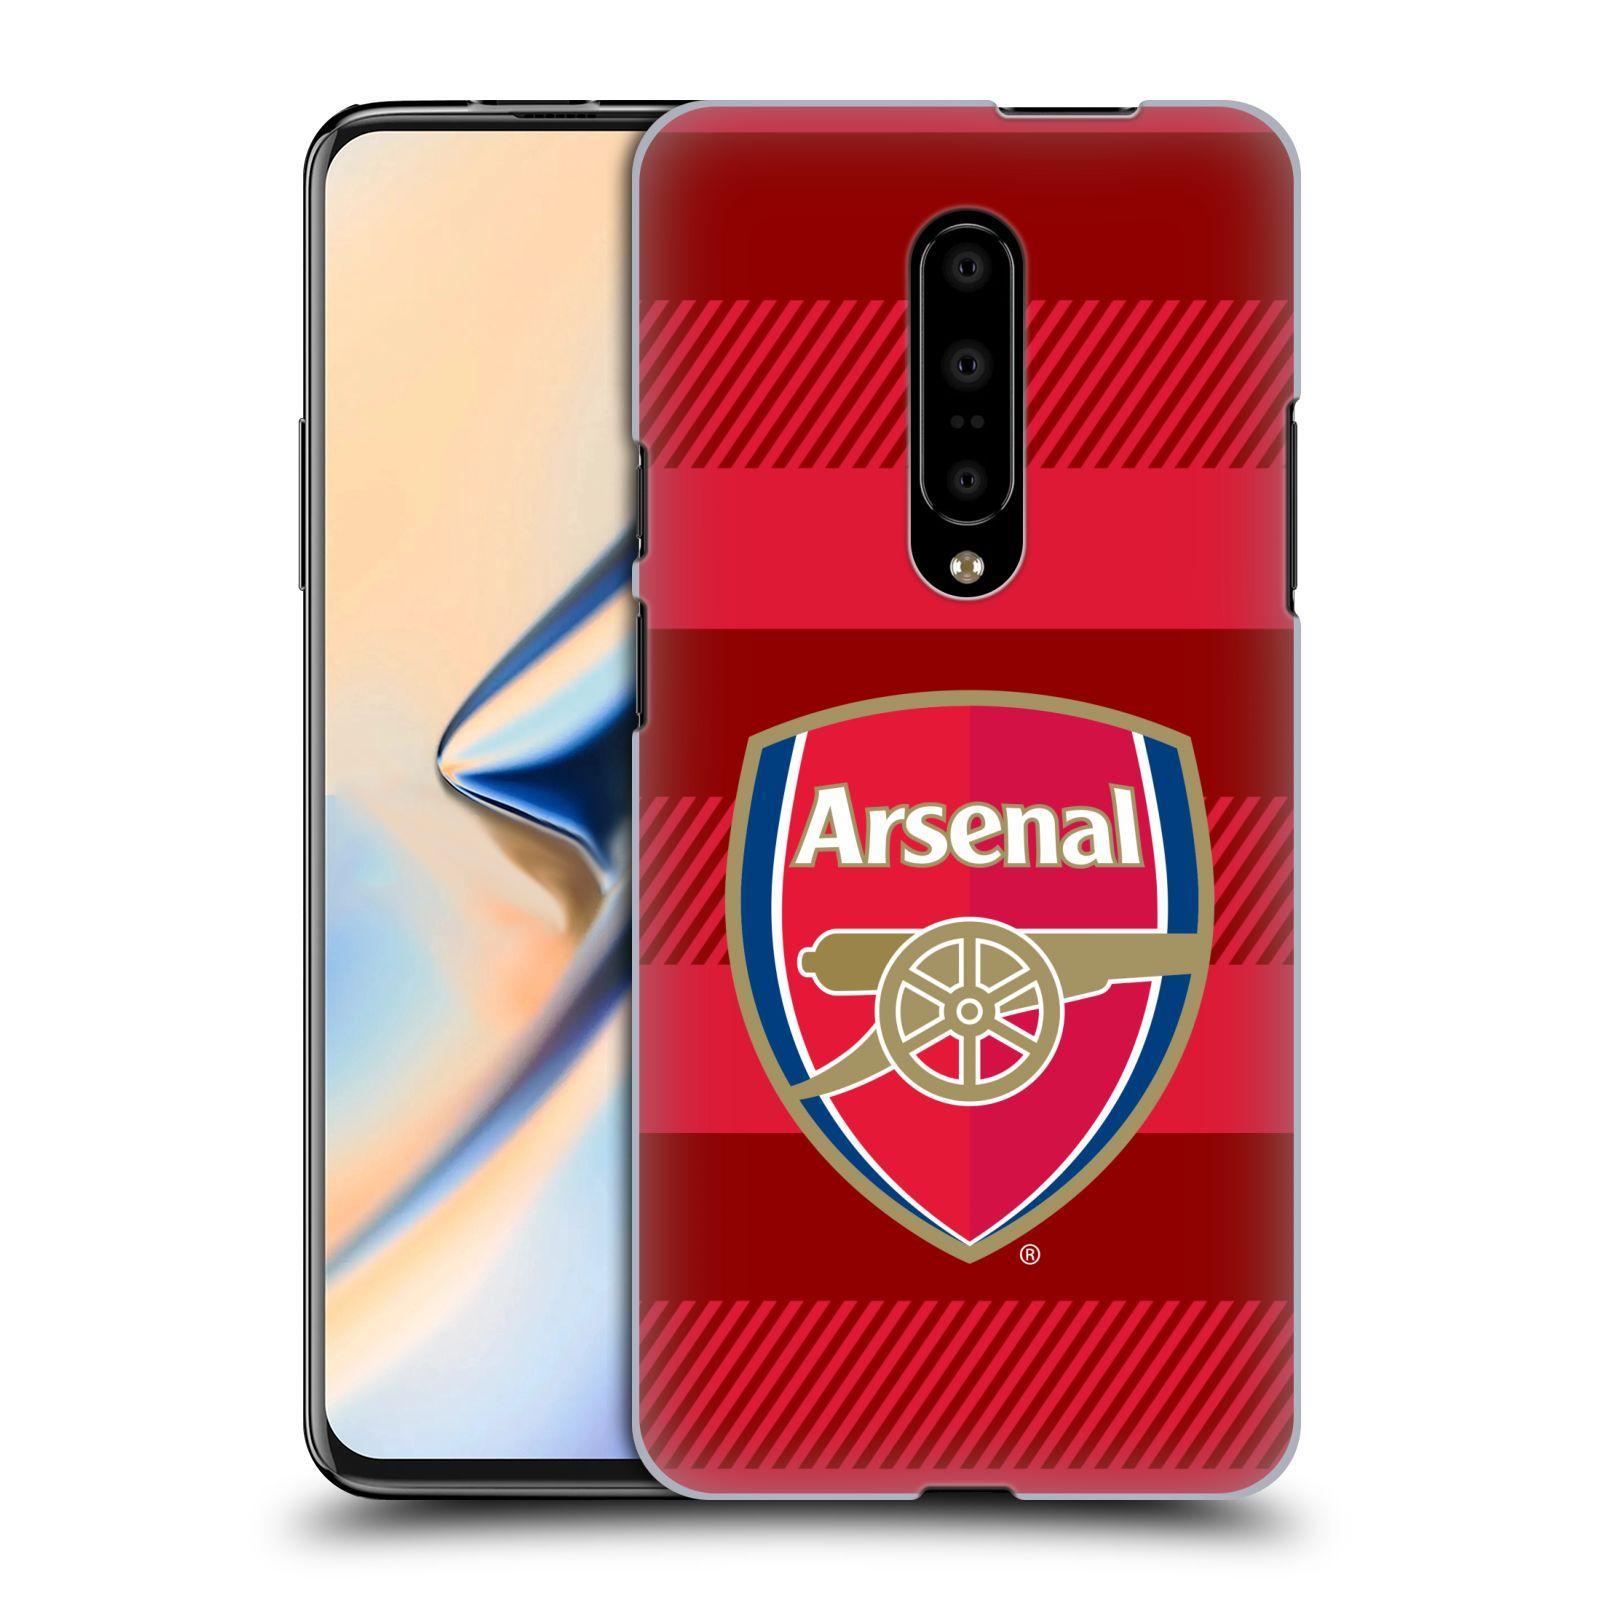 Plastové pouzdro na mobil OnePlus 7 - Head Case - Arsenal FC - Logo s pruhy